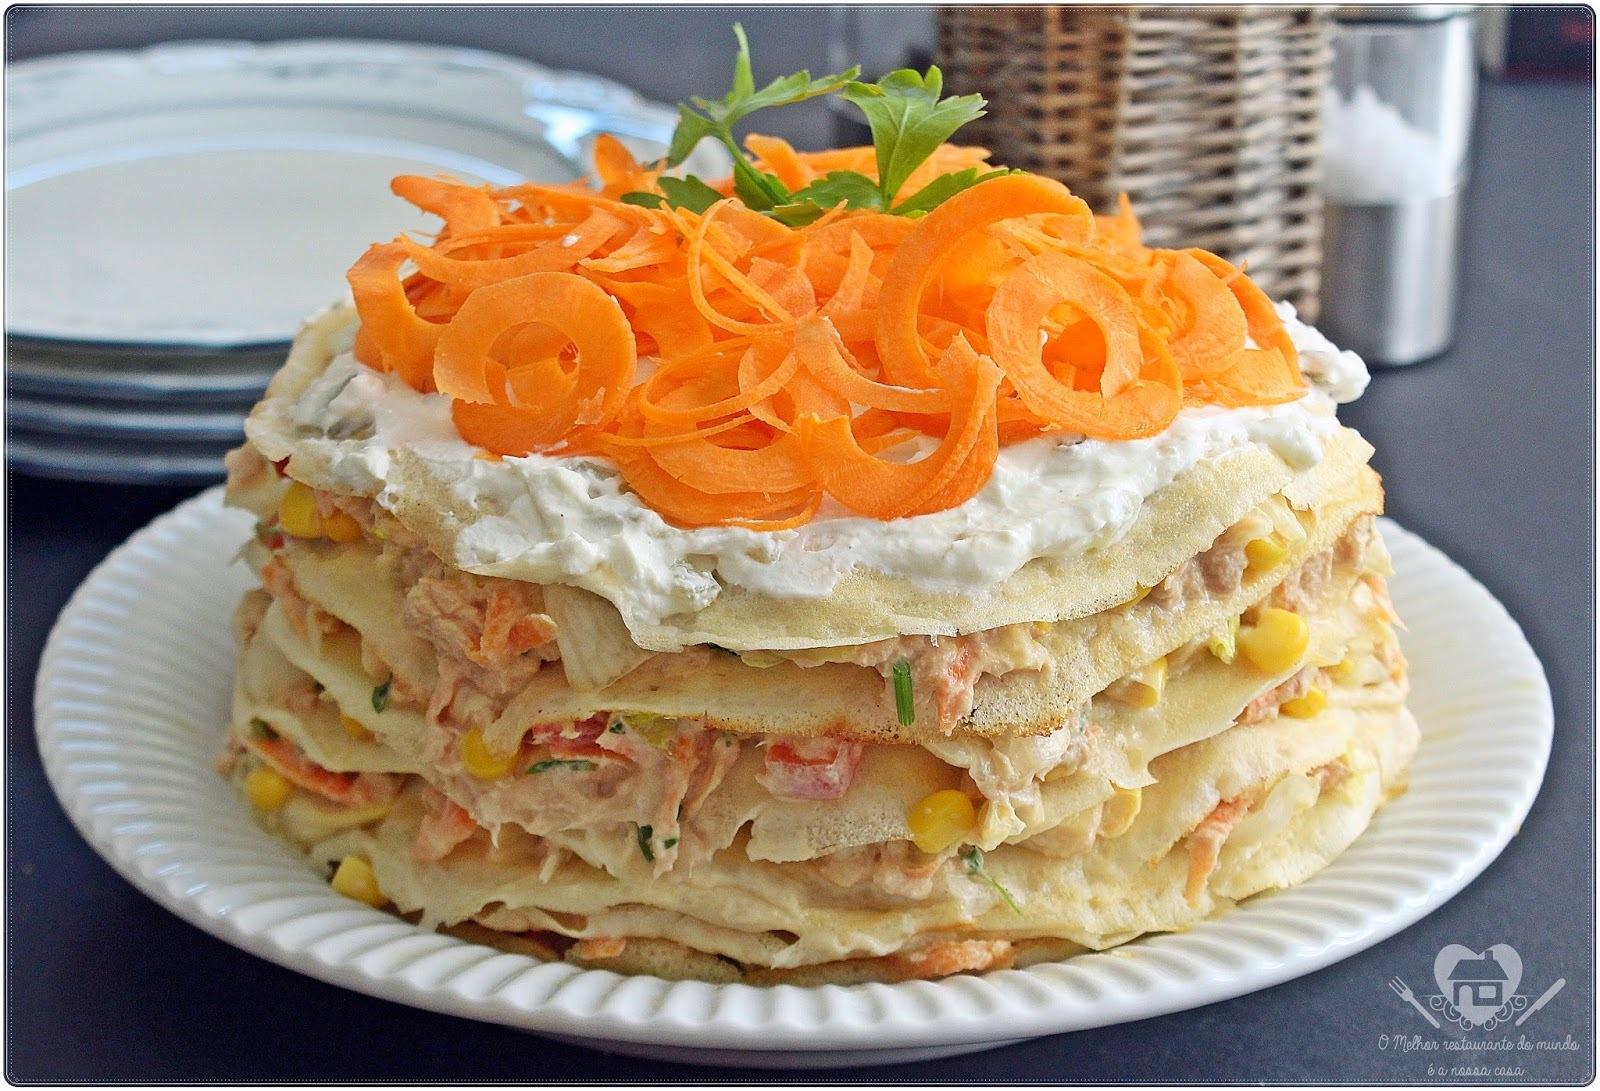 massa de panqueca serve para fazer torta